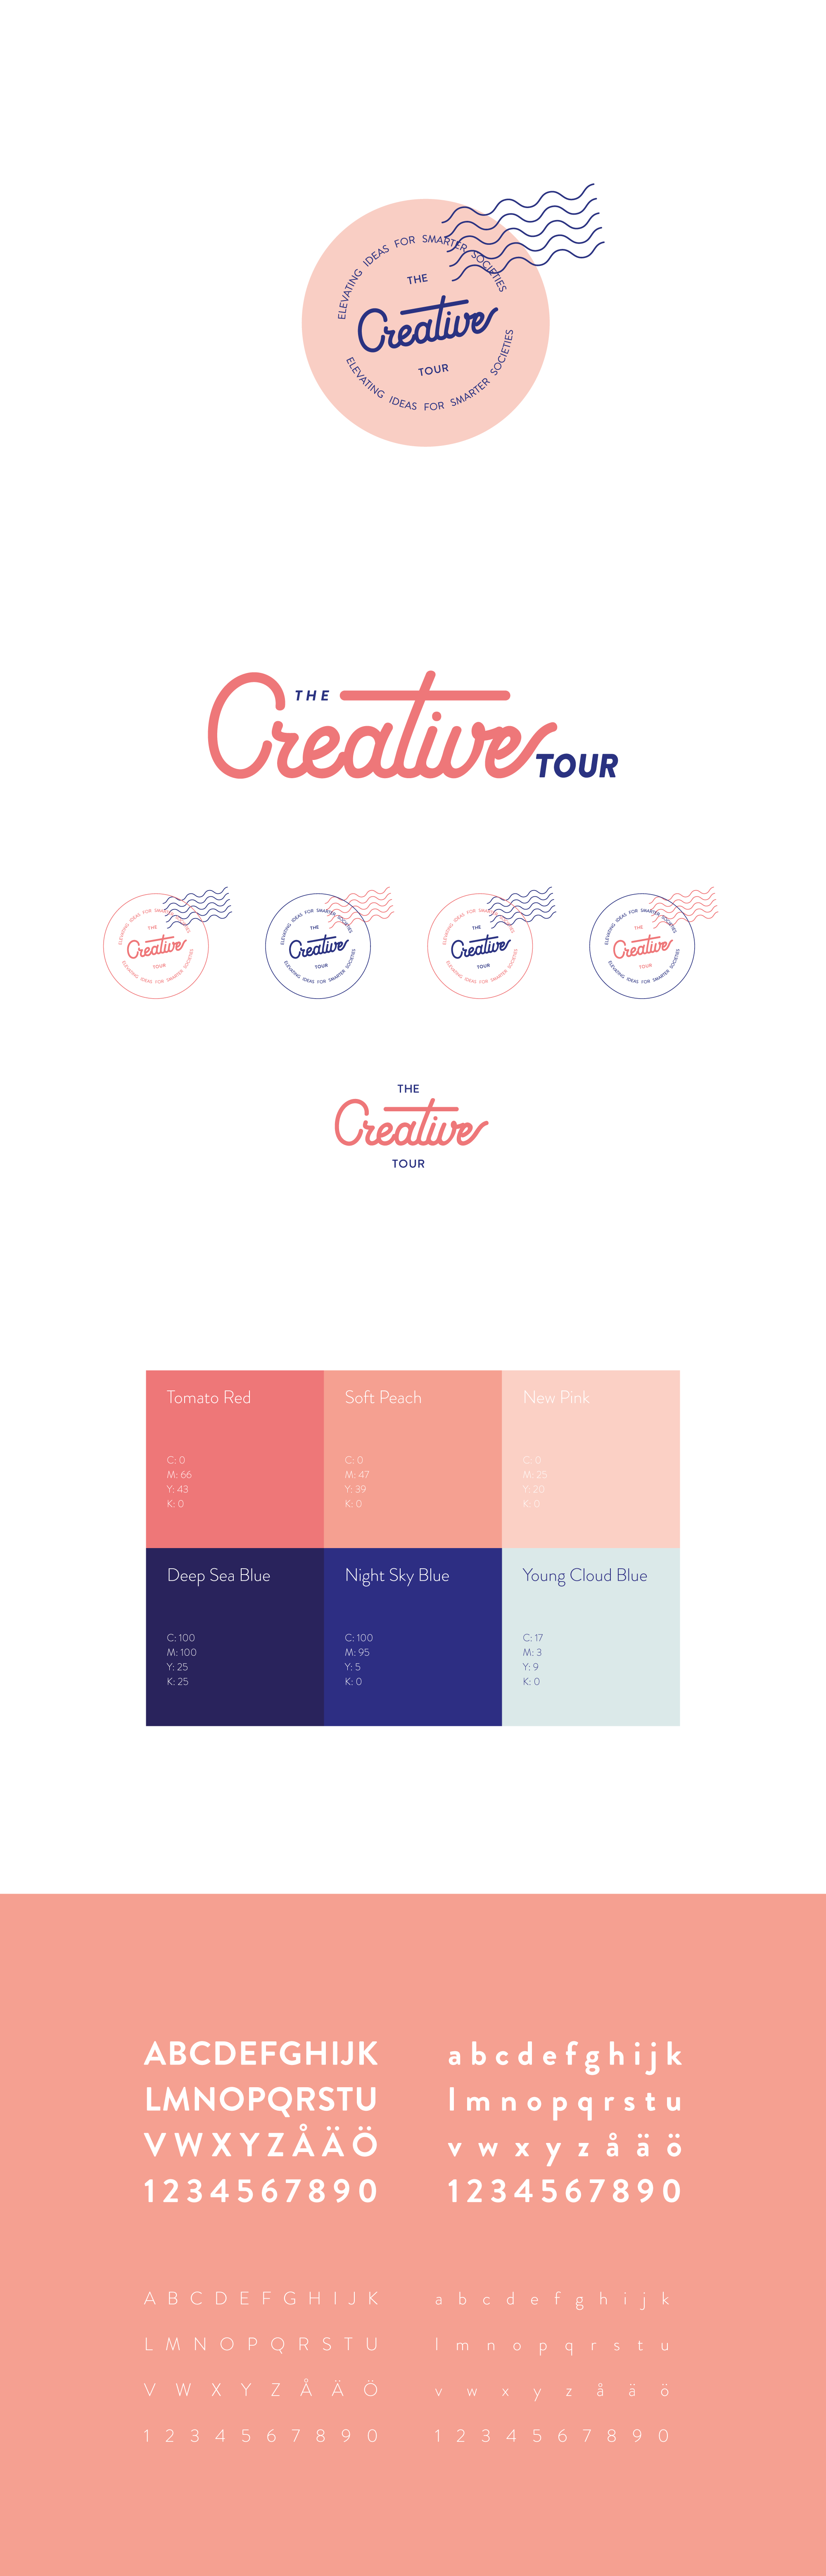 The Creative Tour grafiska profil och logotyp